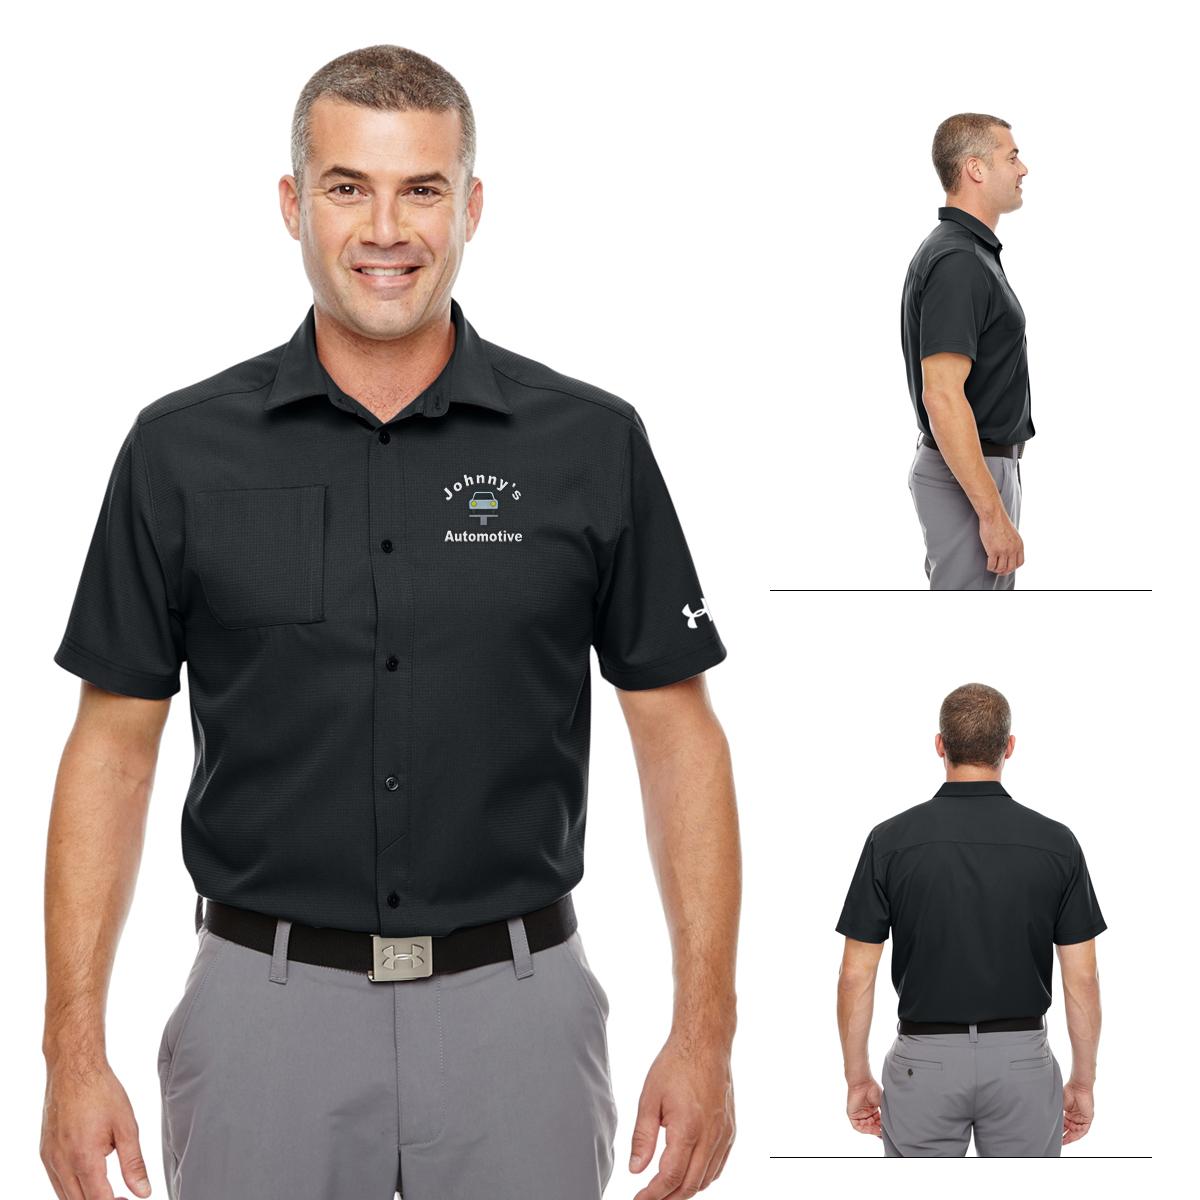 fd93d0bf5d5ae Promotional Under Armour Men's Ultimate Short Sleeve Buttondown ...